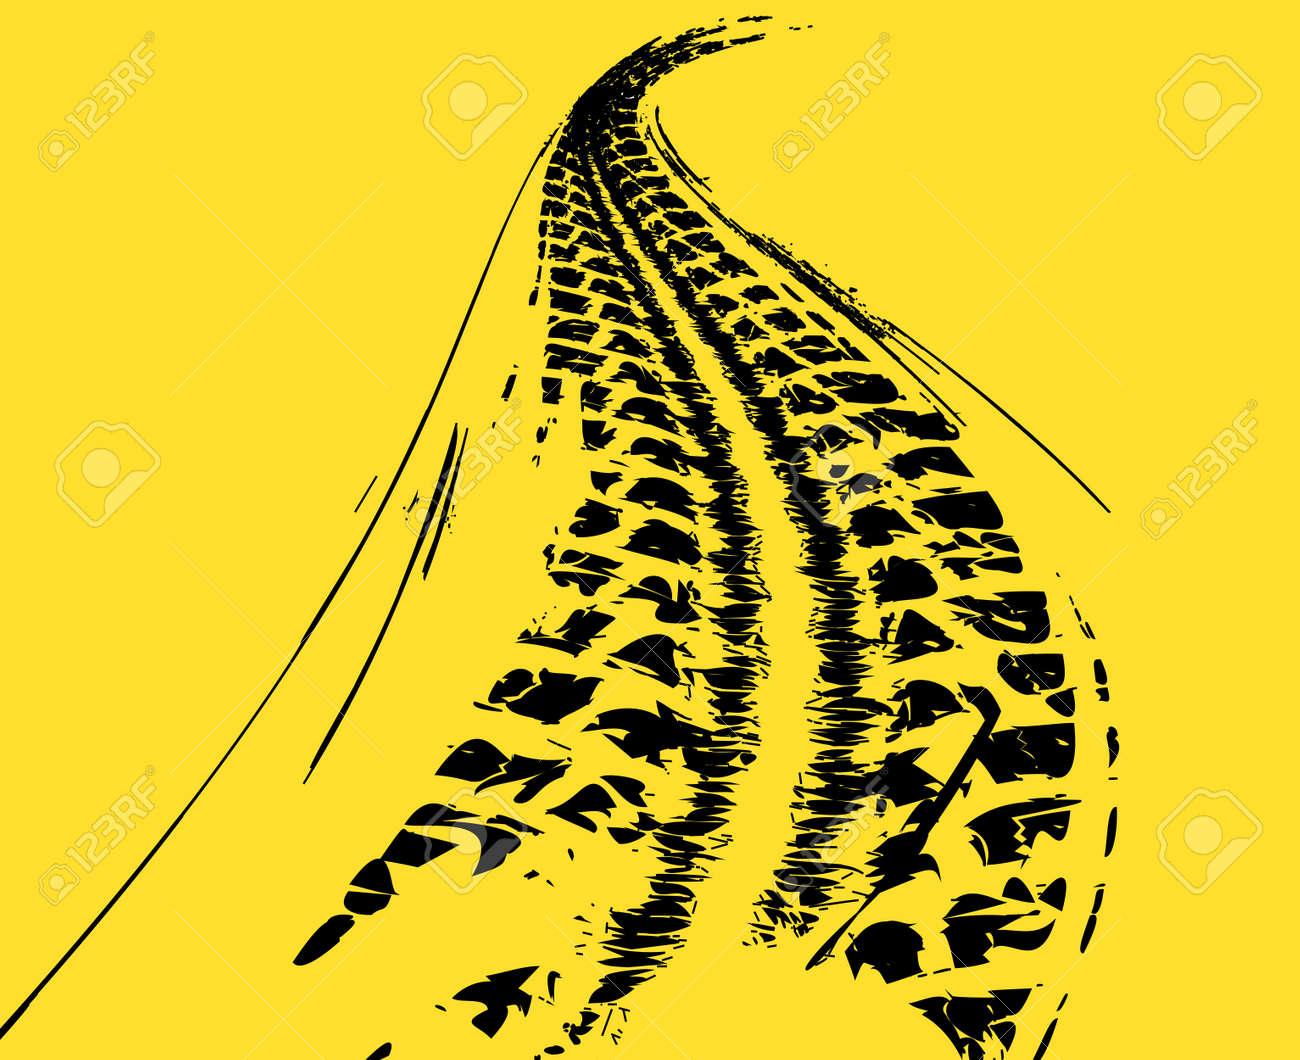 Tire tracks background - 39490997